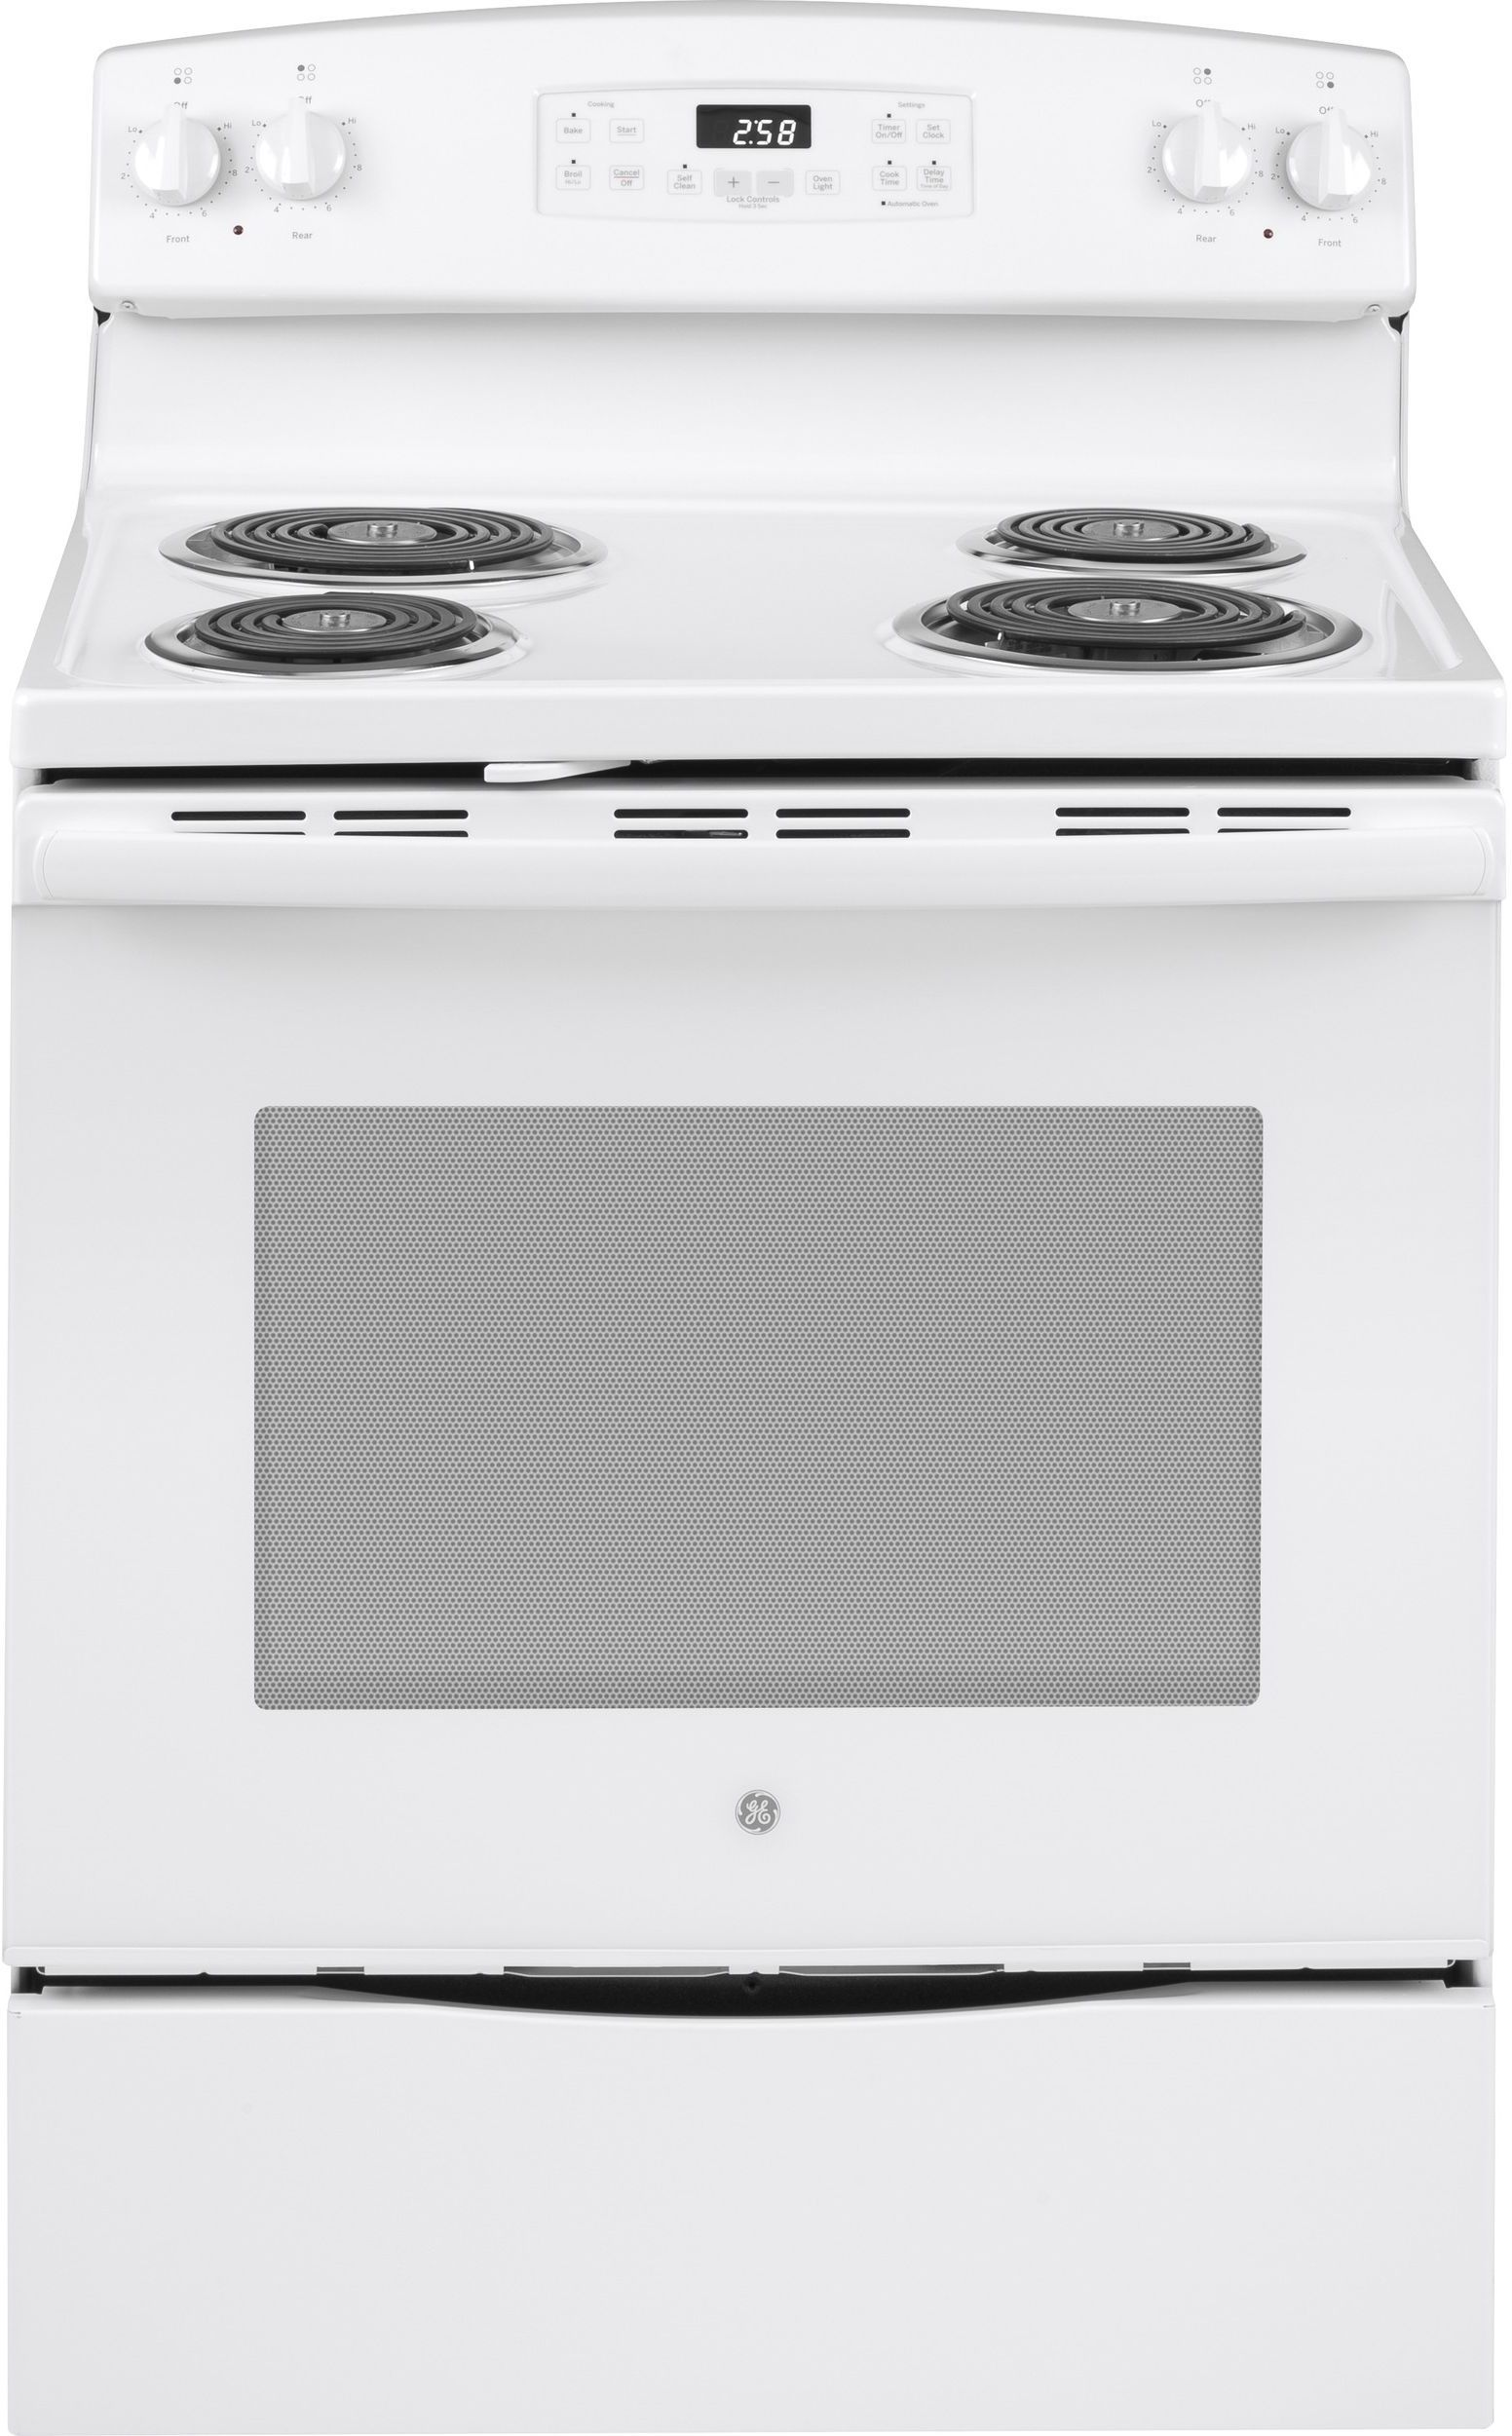 Kitchen Appliances & Home Appliance in Yakima, WA  | Bemis Appliance